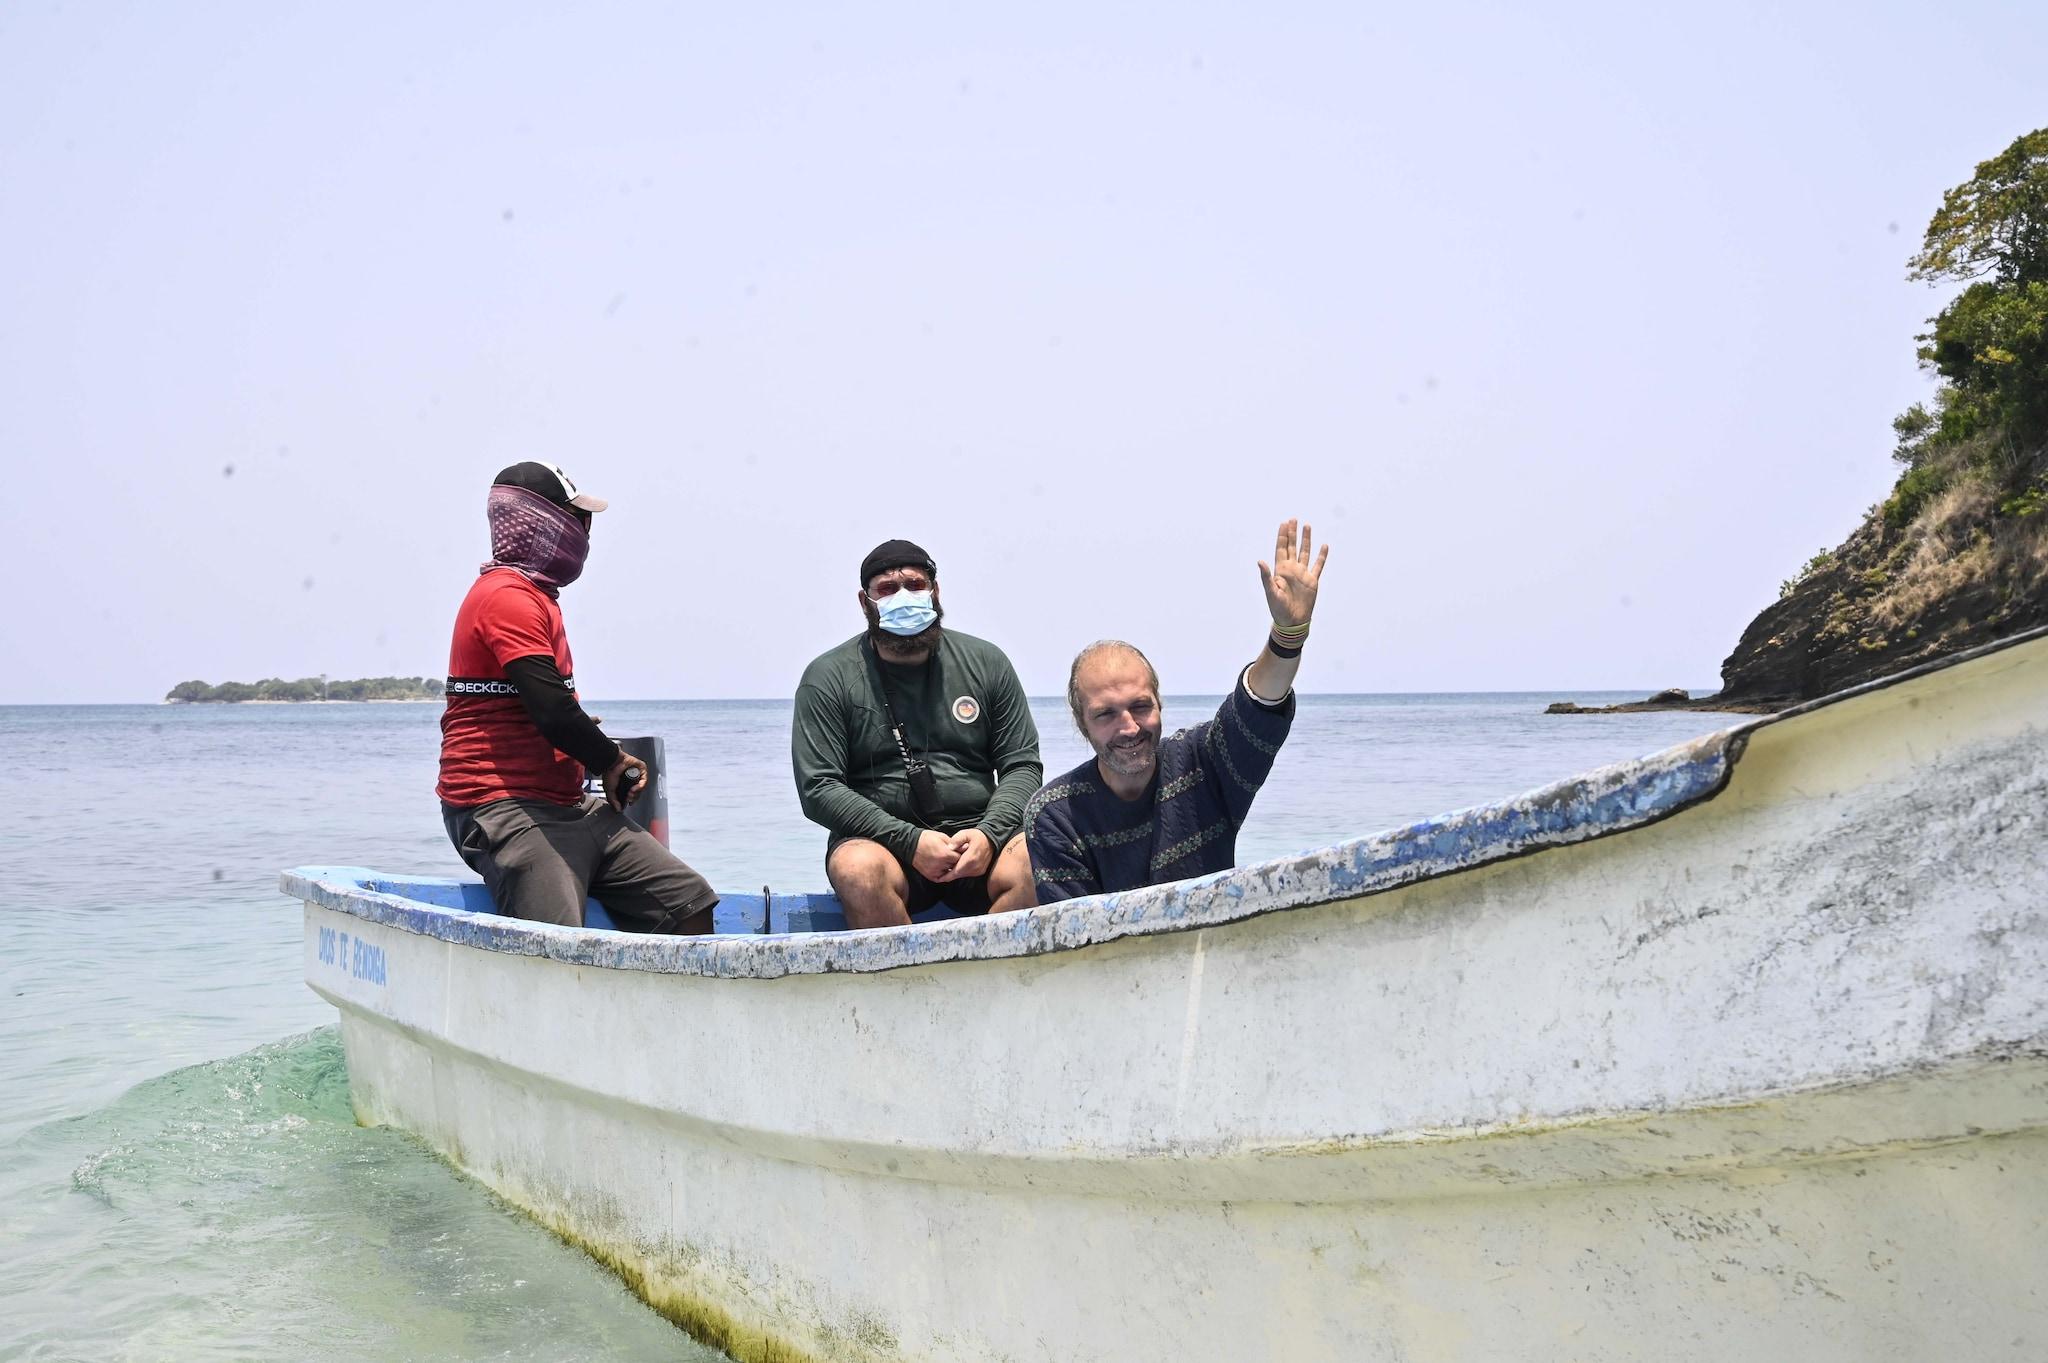 Ubaldo Lanzo lascia l'Isola (foto IPA)